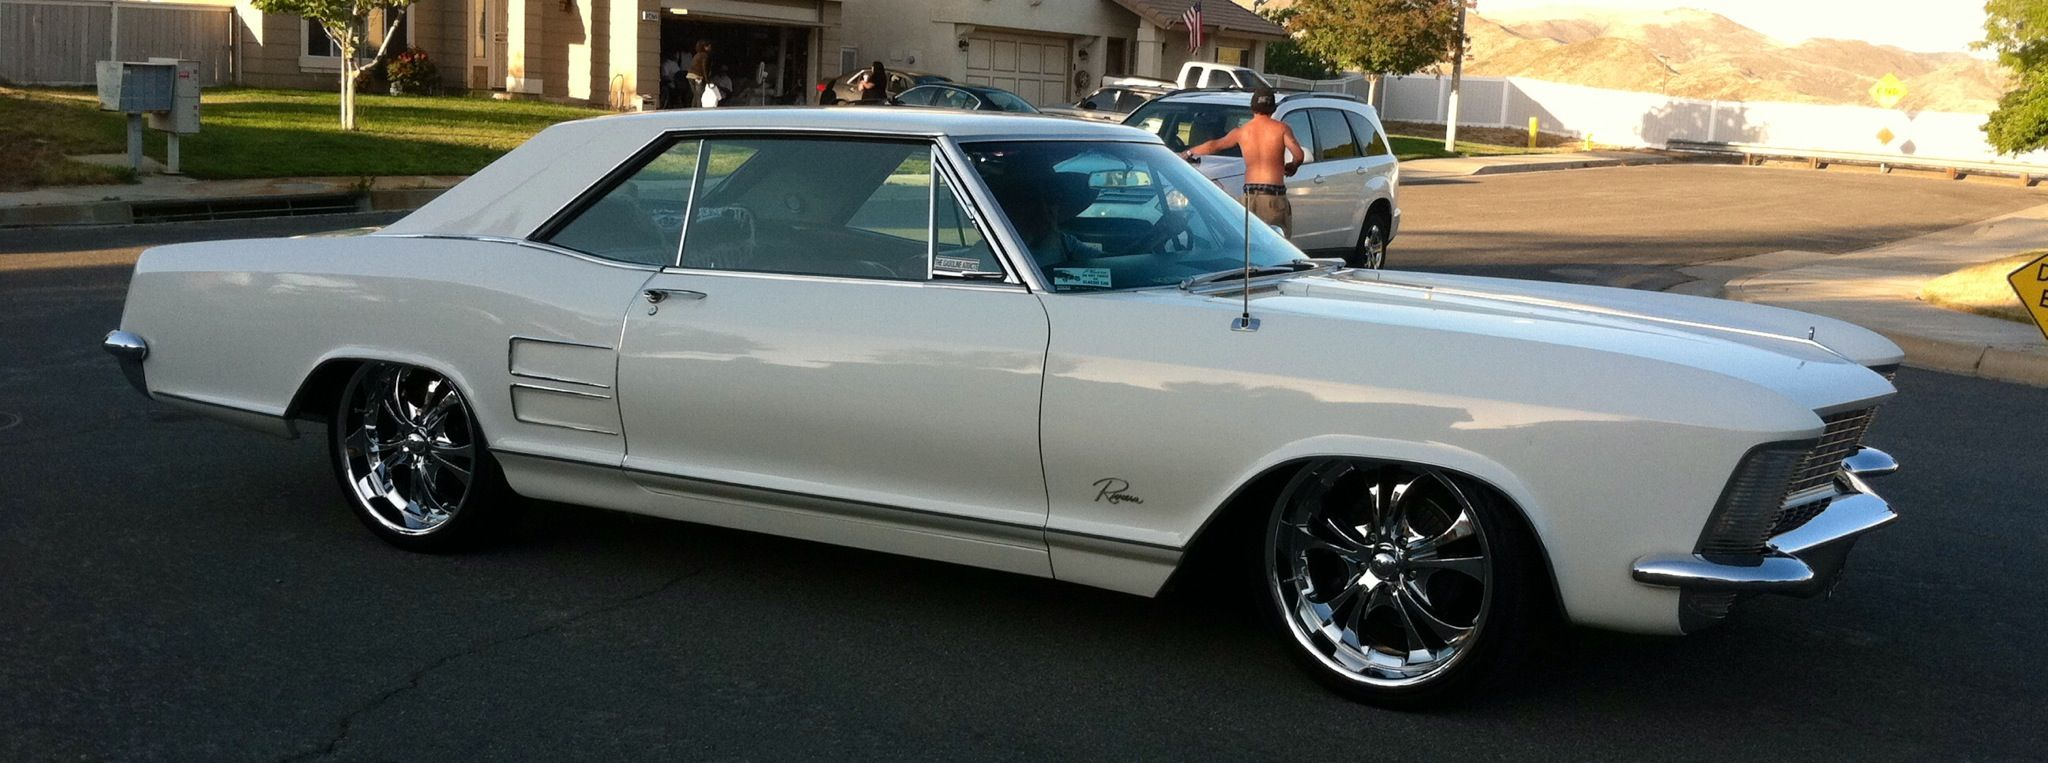 64 Riviera Buick riviera, Riviera, Buick